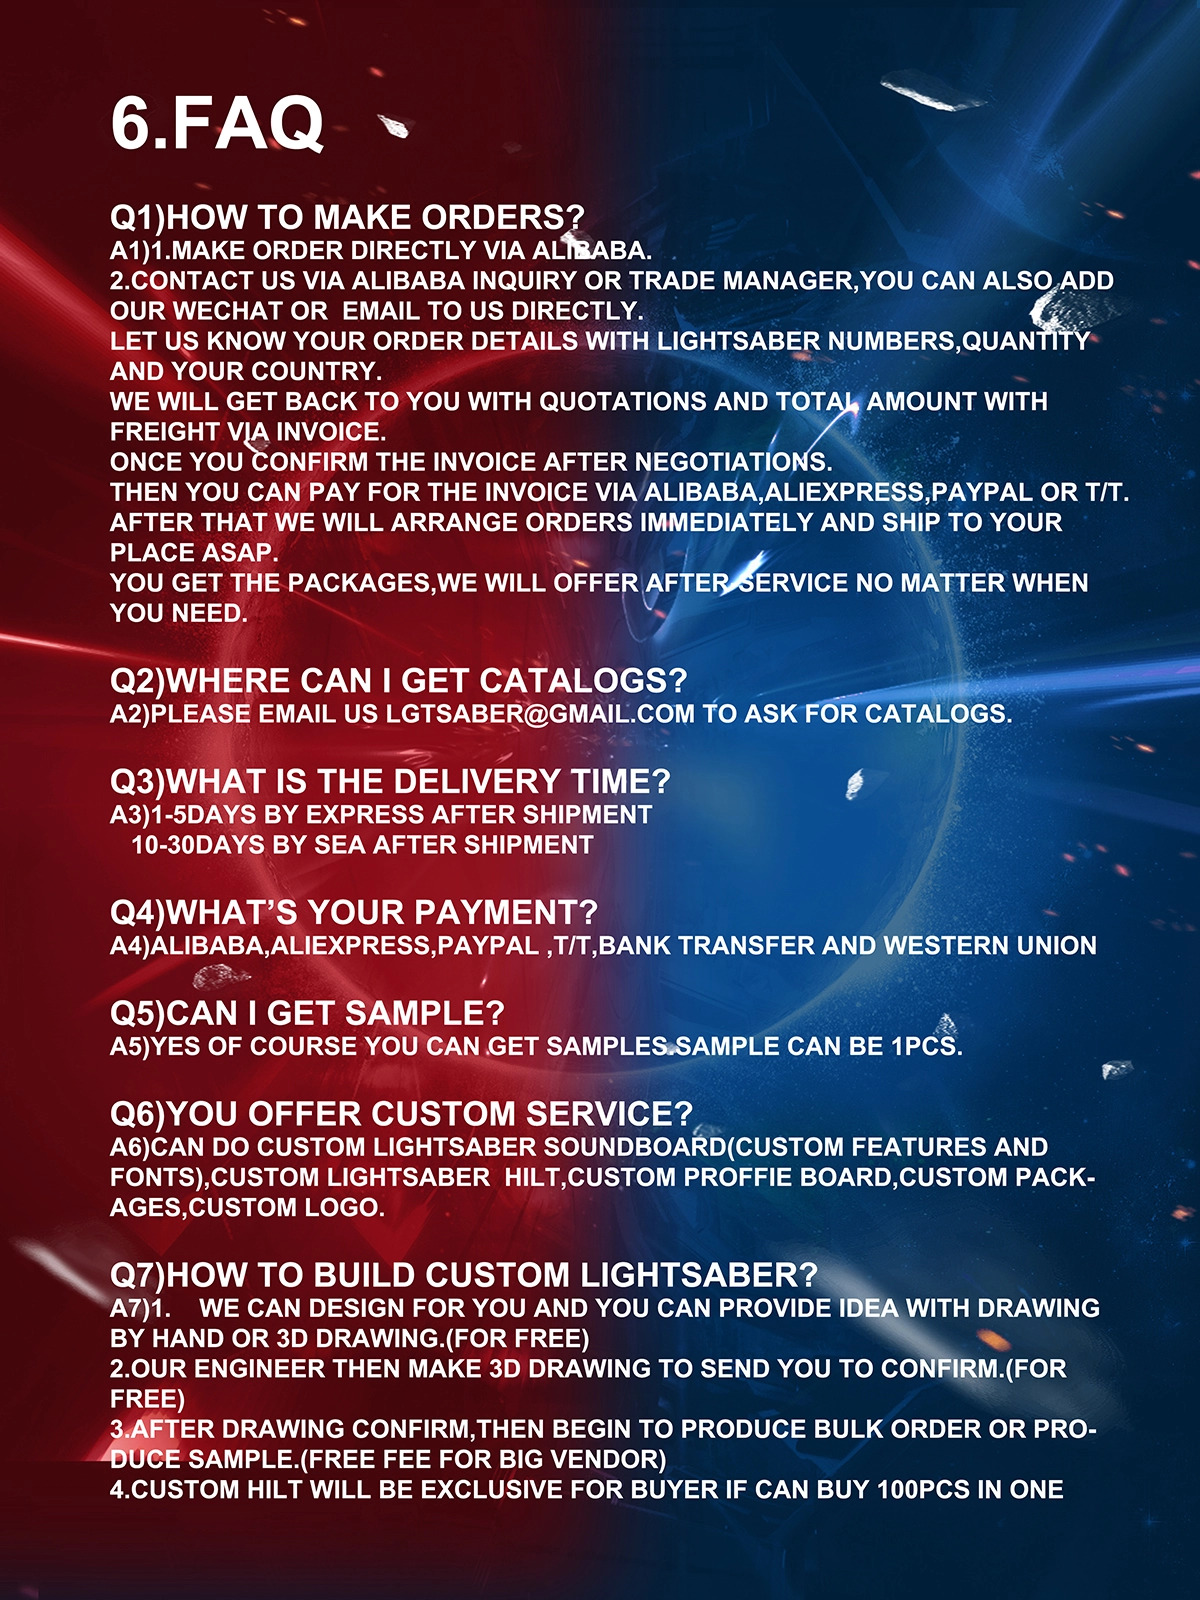 Lgt Saberstudio Obi-wan star laser sword infinite color sensitive rechargeable lightsaber for cosplay entertainment